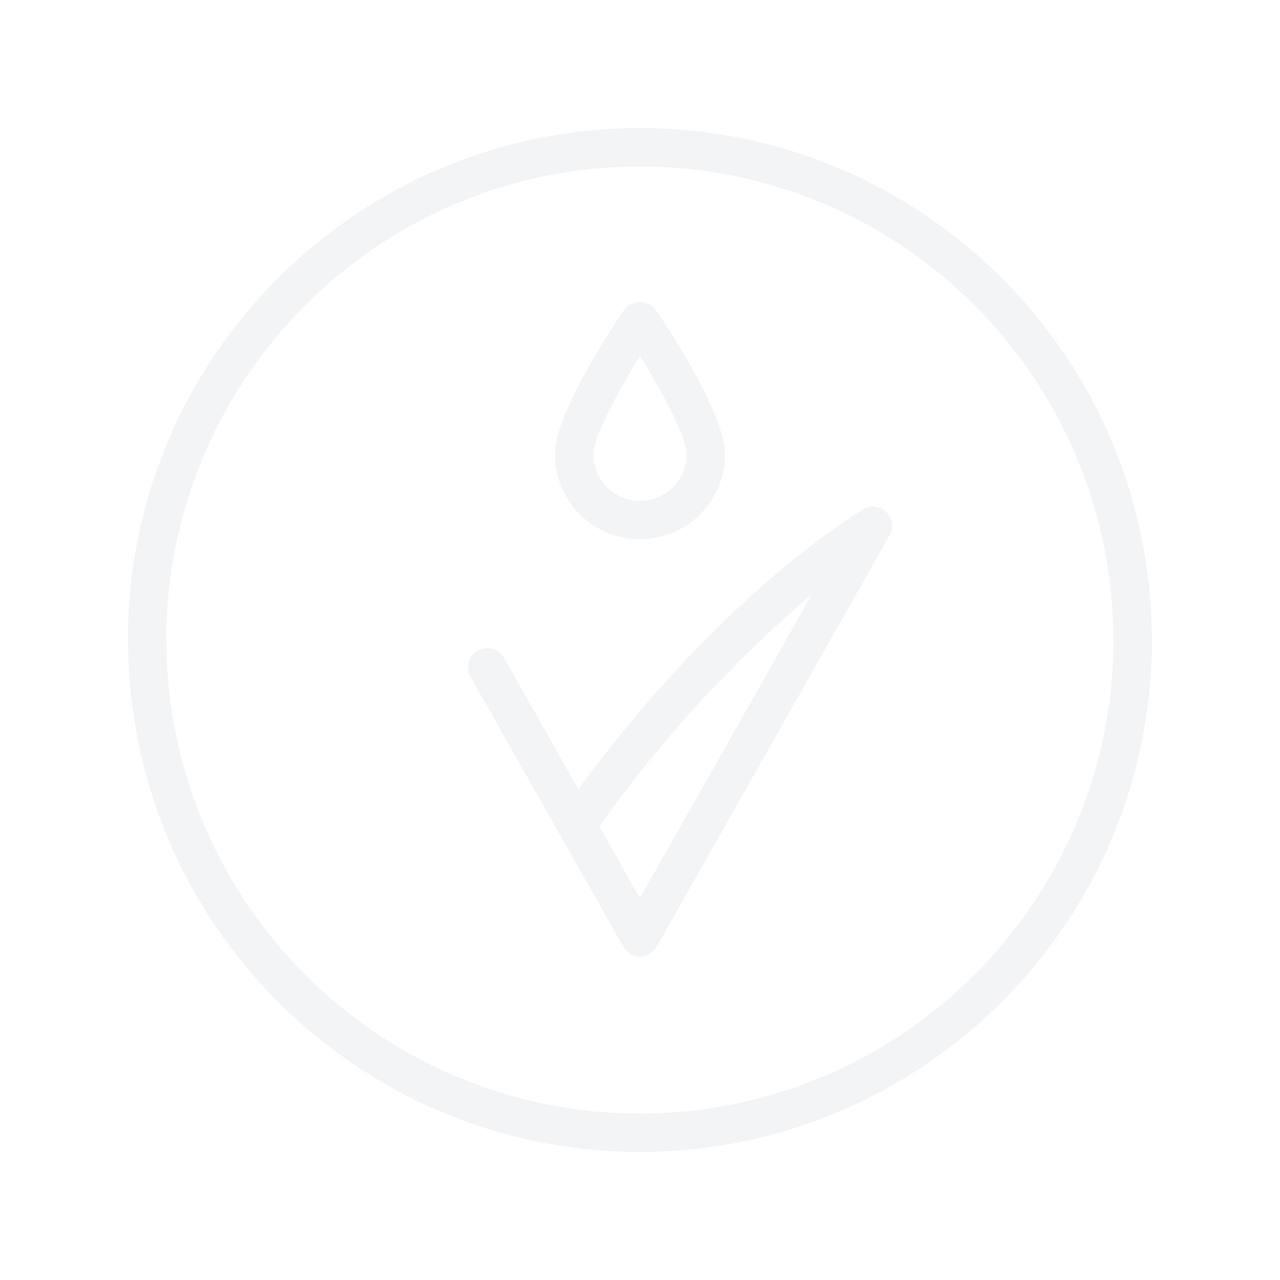 WELLA PROFESSIONALS Oil Reflections Luminous Reveal Shampoo 250ml